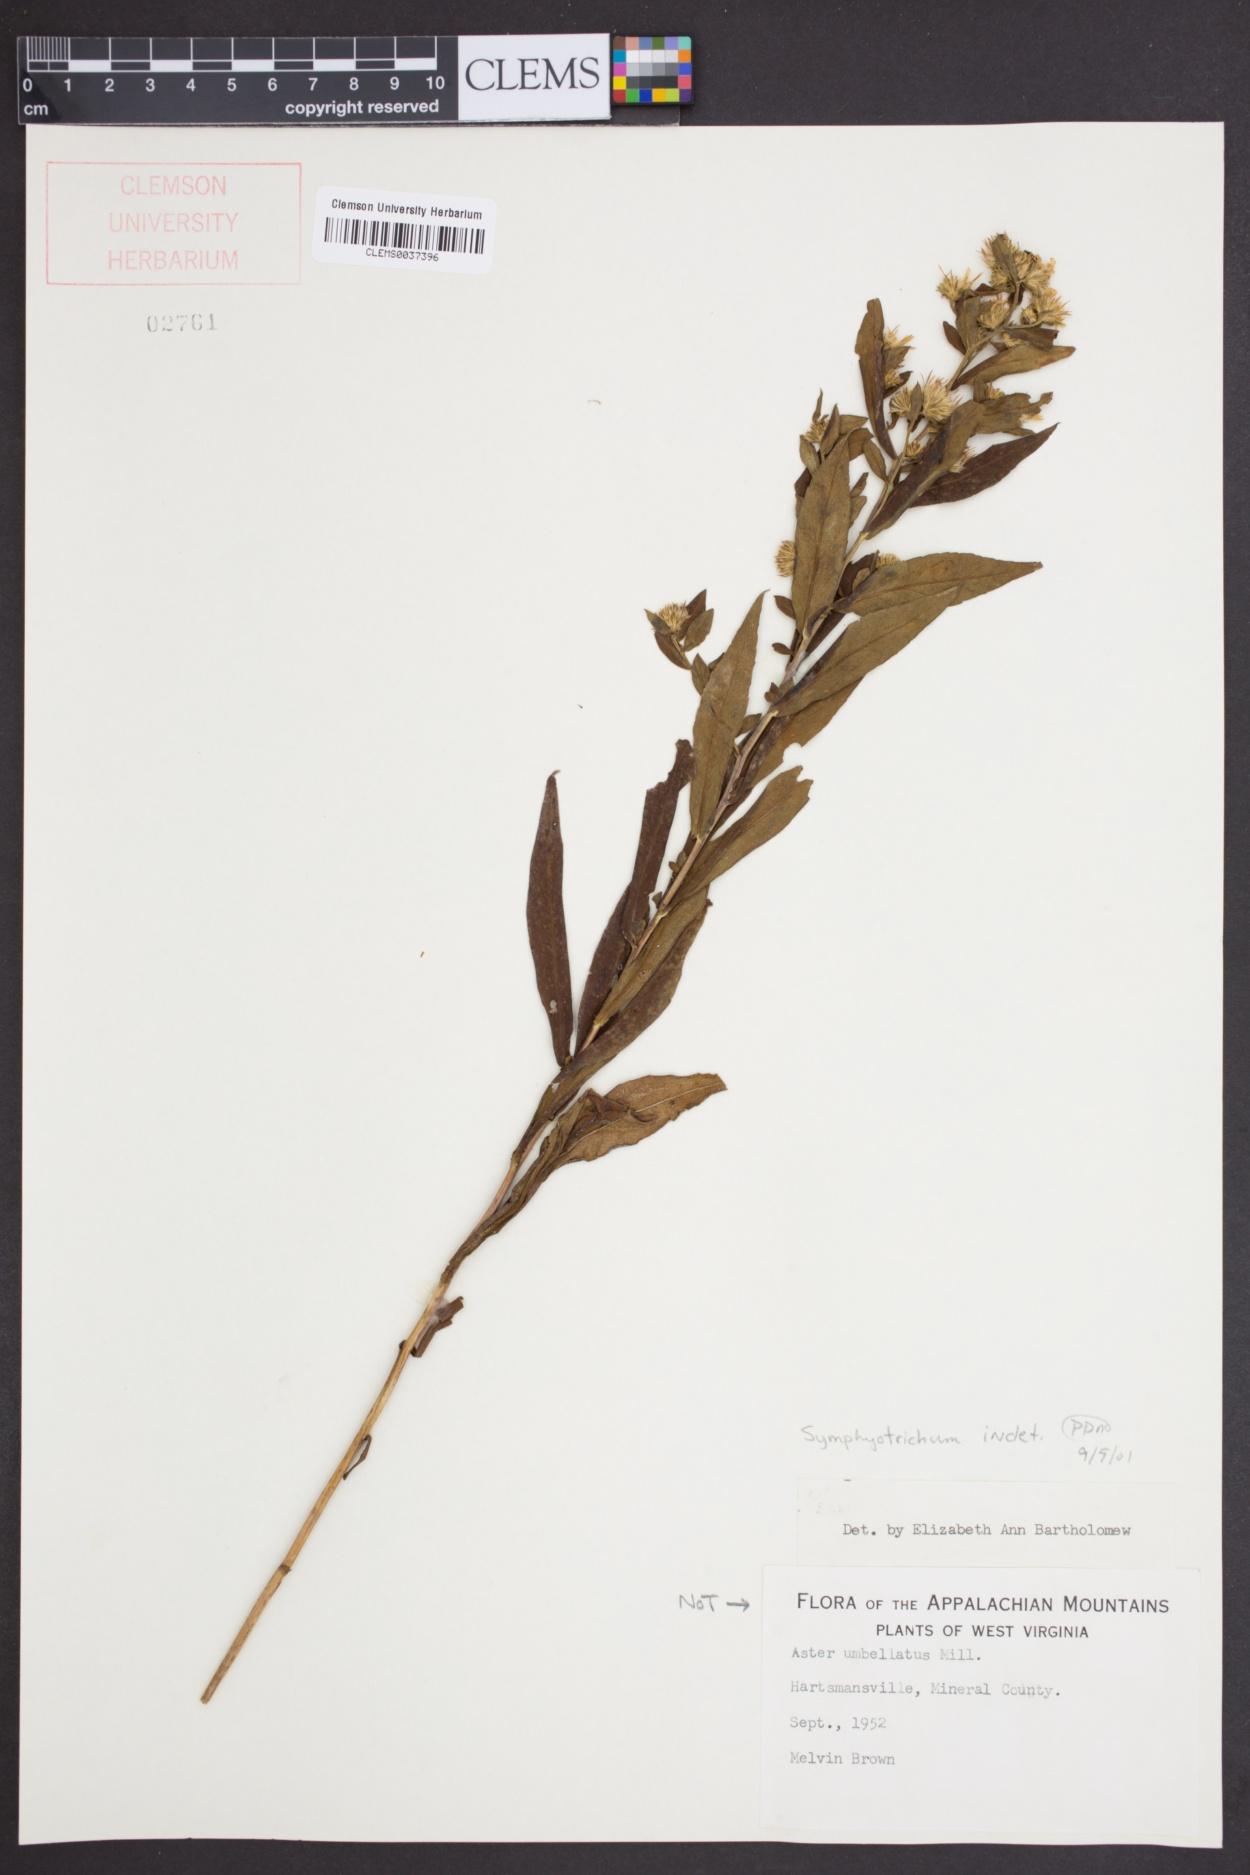 Symphyotrichum image